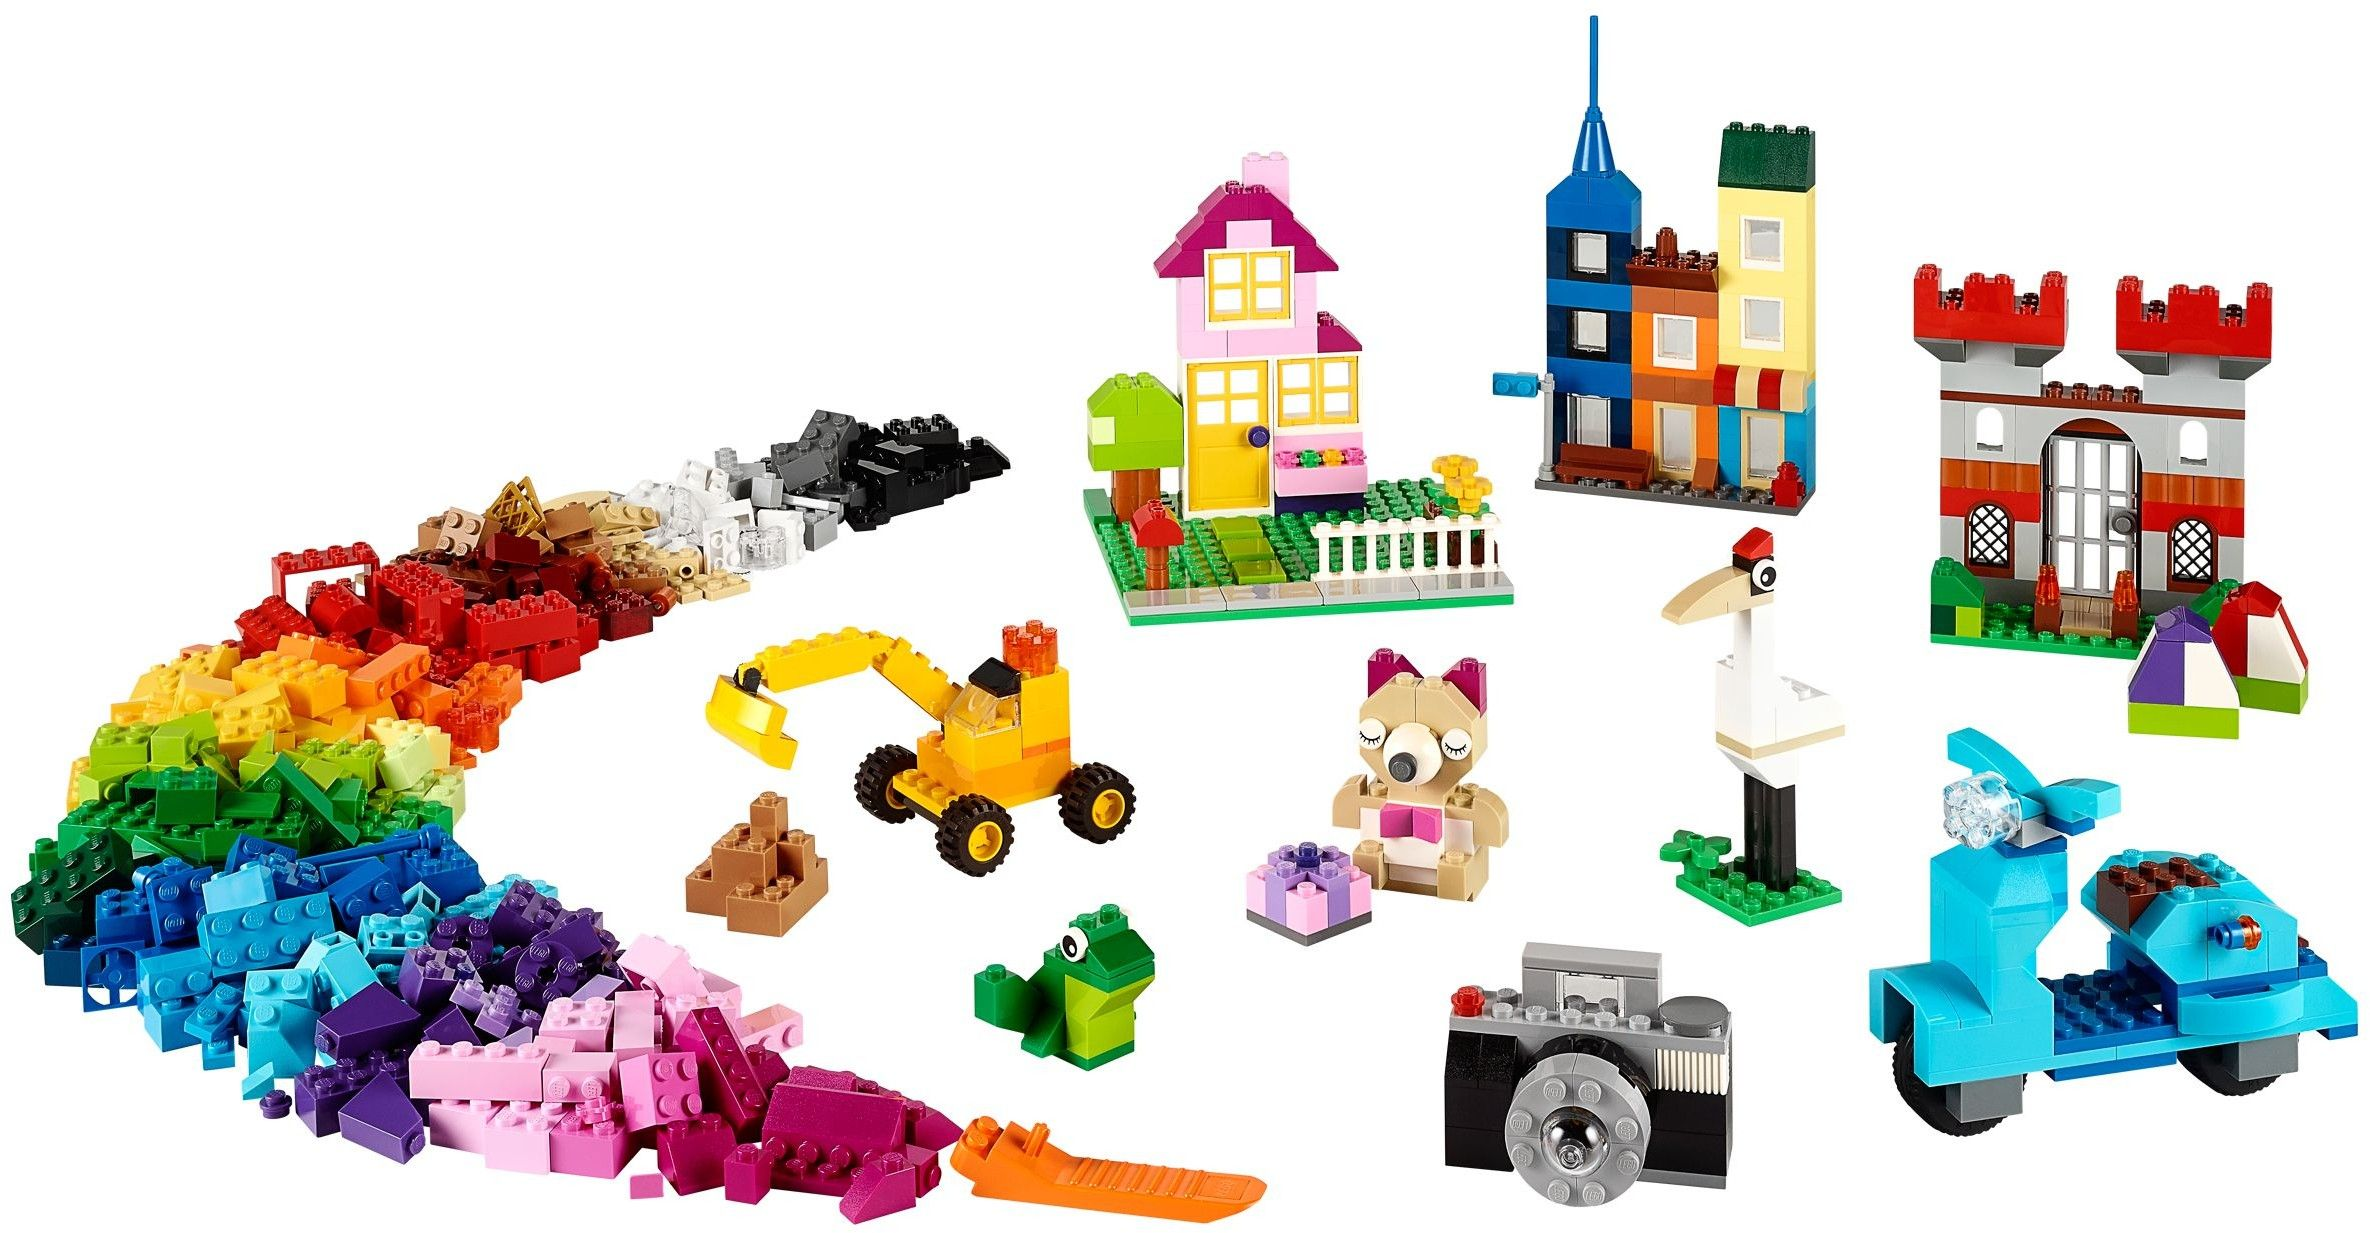 Lepin 42011 Builerds Building Block Toy 1105pcs